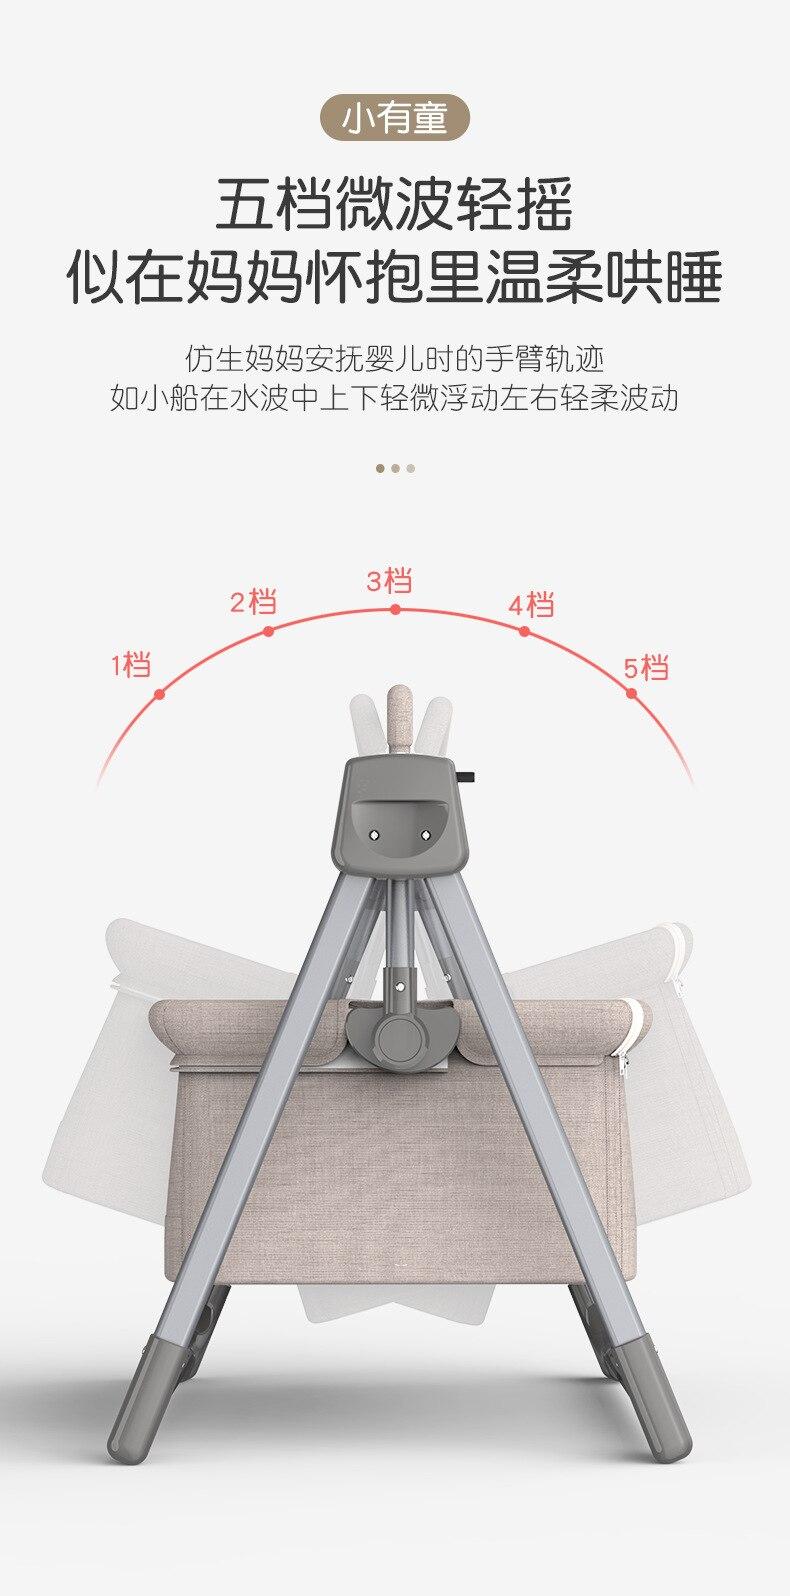 Hf2886b9e86e64f67b3e8953c71920eba1 2020 Baby Intelligent Electric Cradle Rocker Multifunctional Newborn Intelligent Rocking Chair Send Storage Bag and Mosquito Net